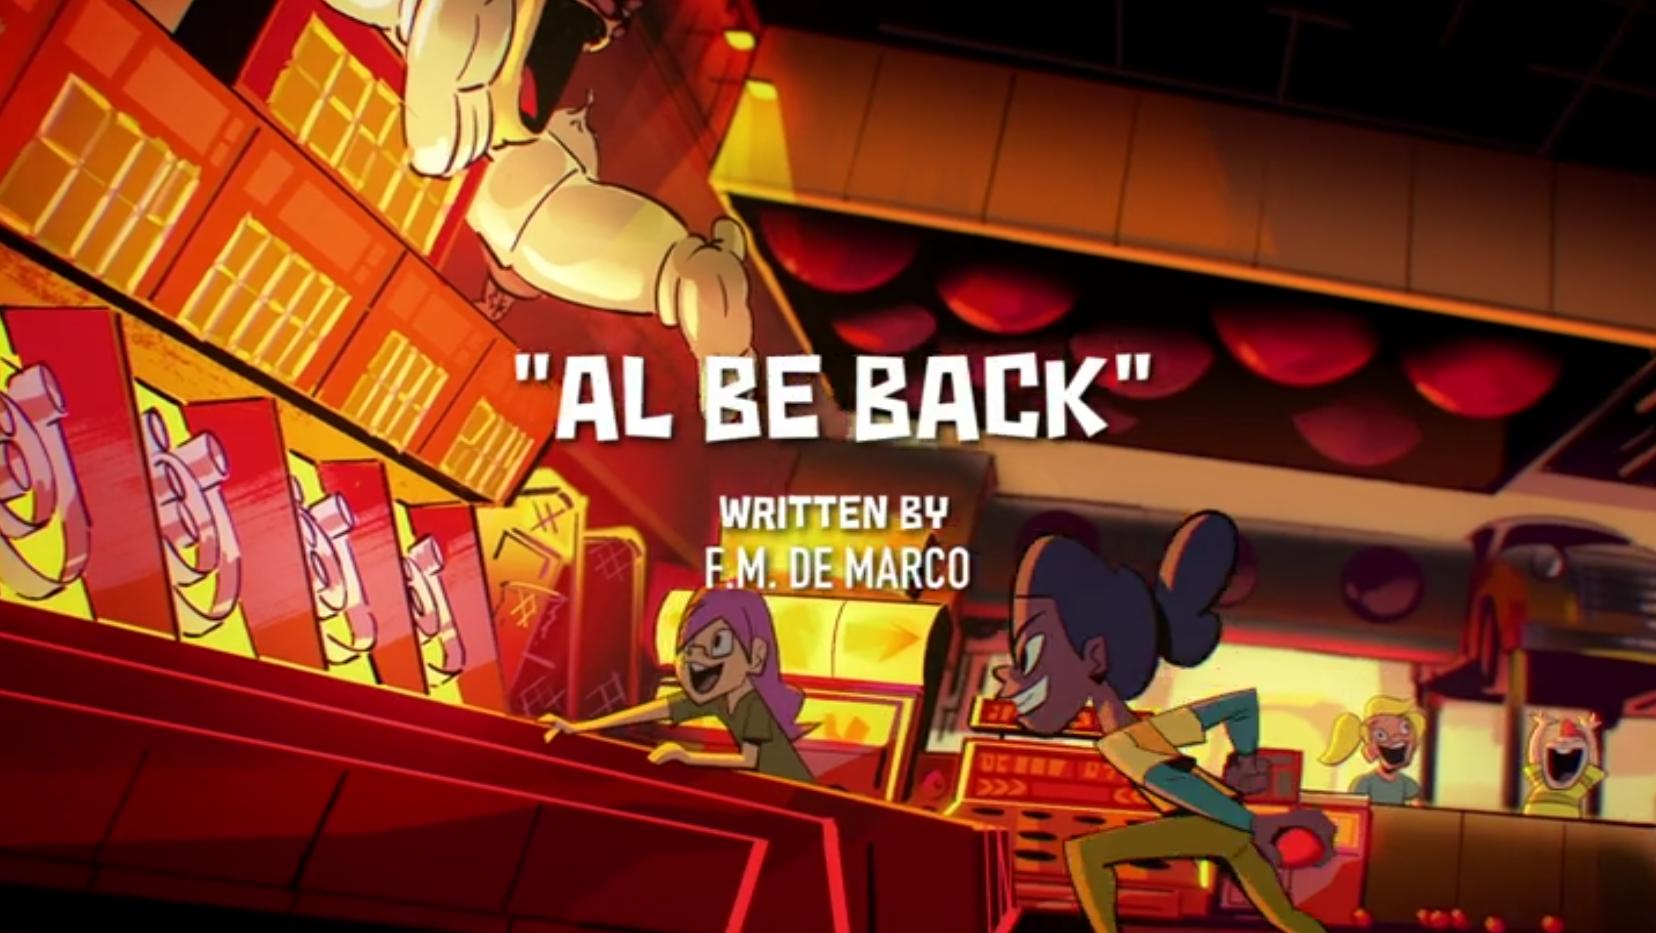 Al Be Back